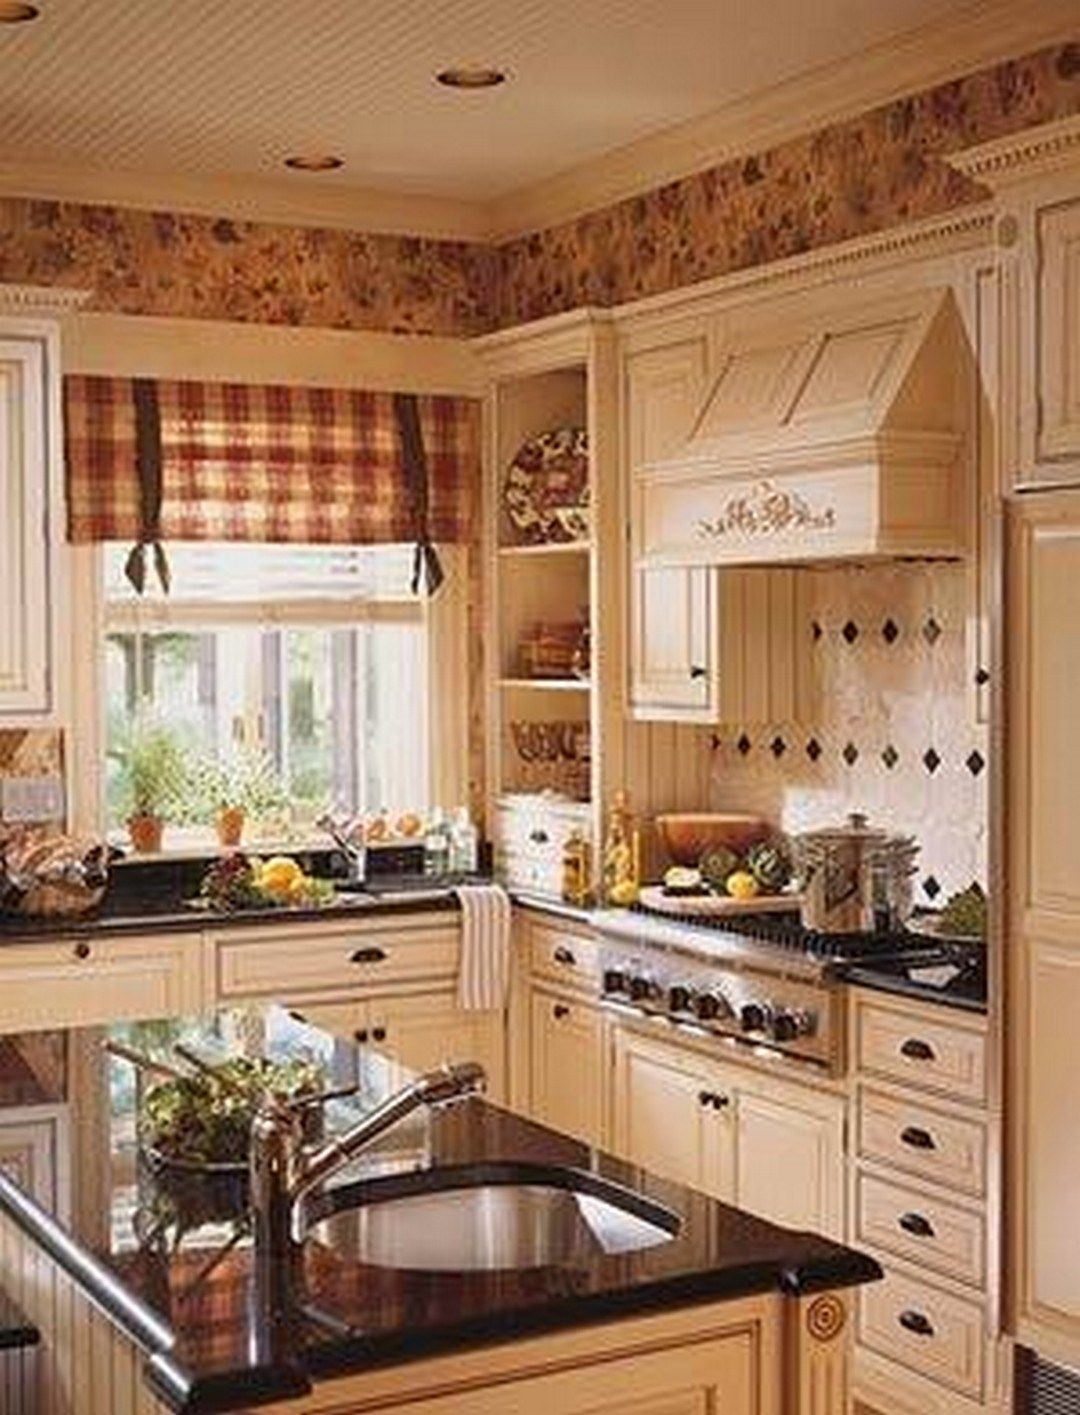 99 French Country Kitchen Modern Design Ideas (51